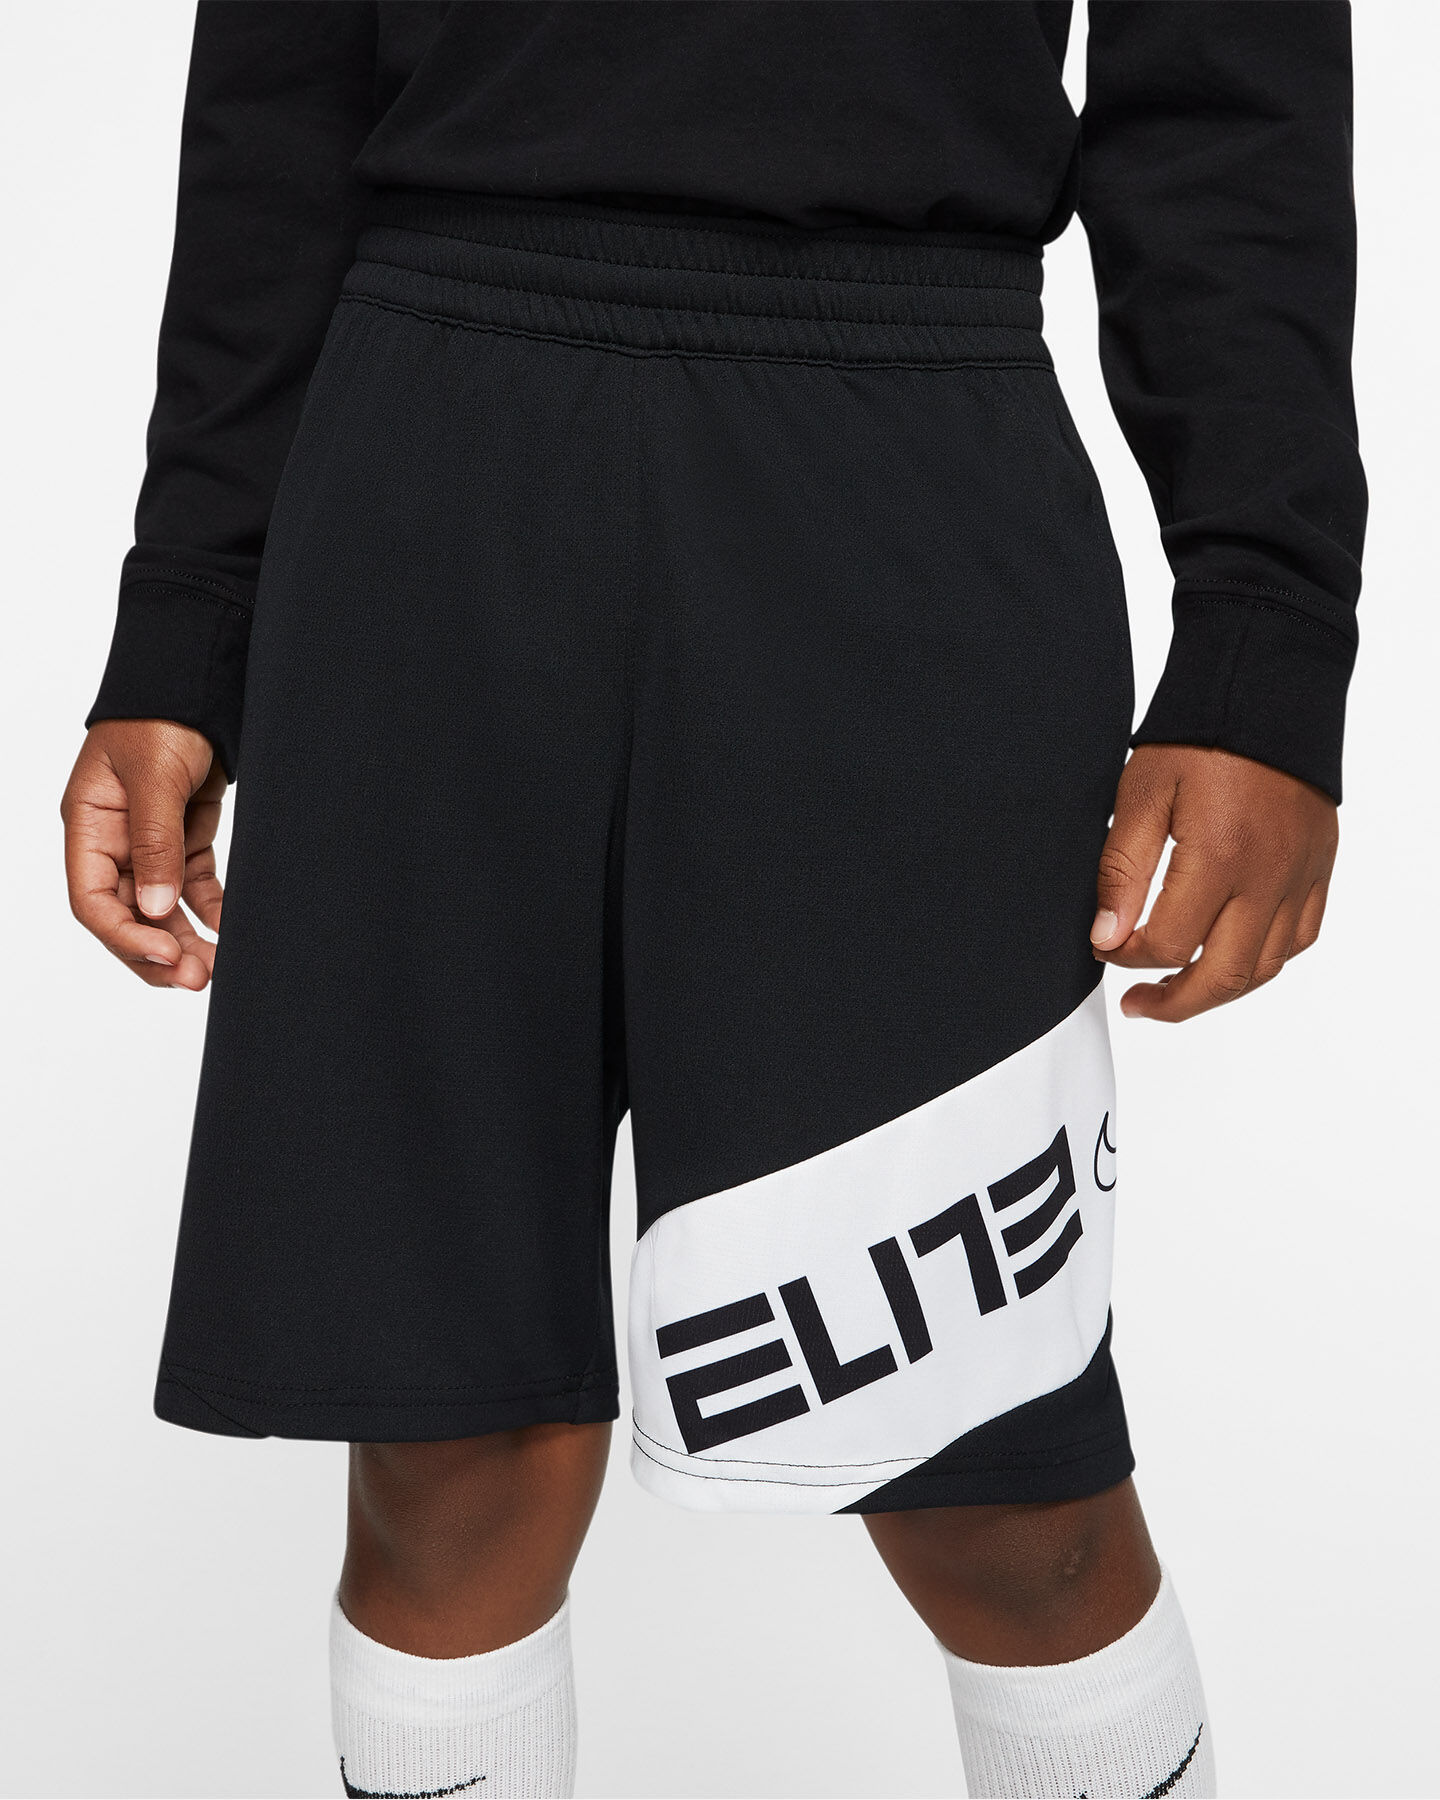 Pantaloncini NIKE ELITE JR S5164664 scatto 3